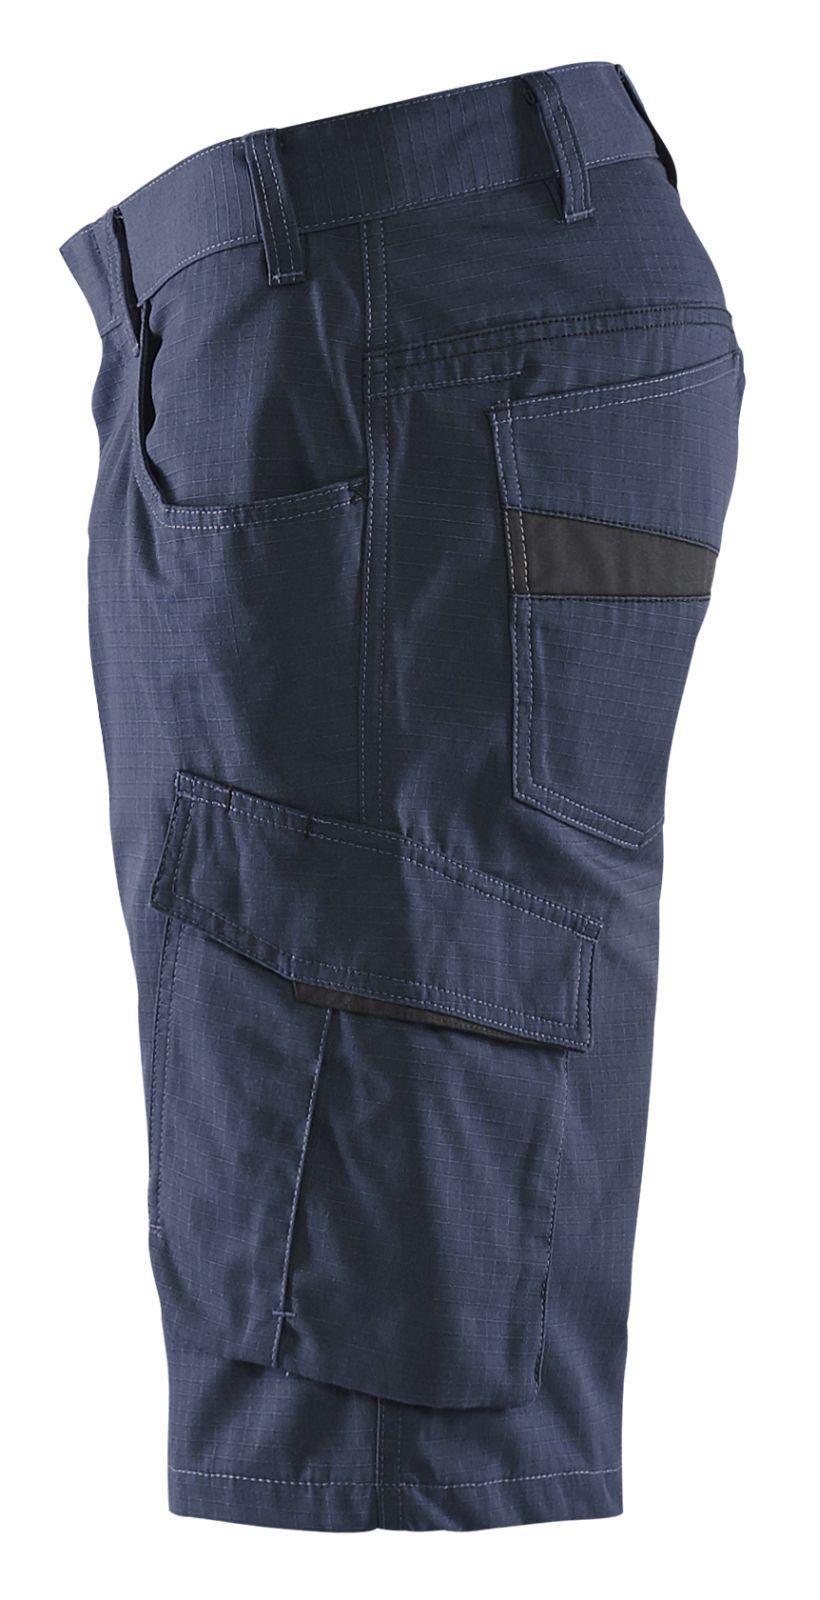 Blaklader Broeken 14991330 donker marineblauw-zwart(8699)